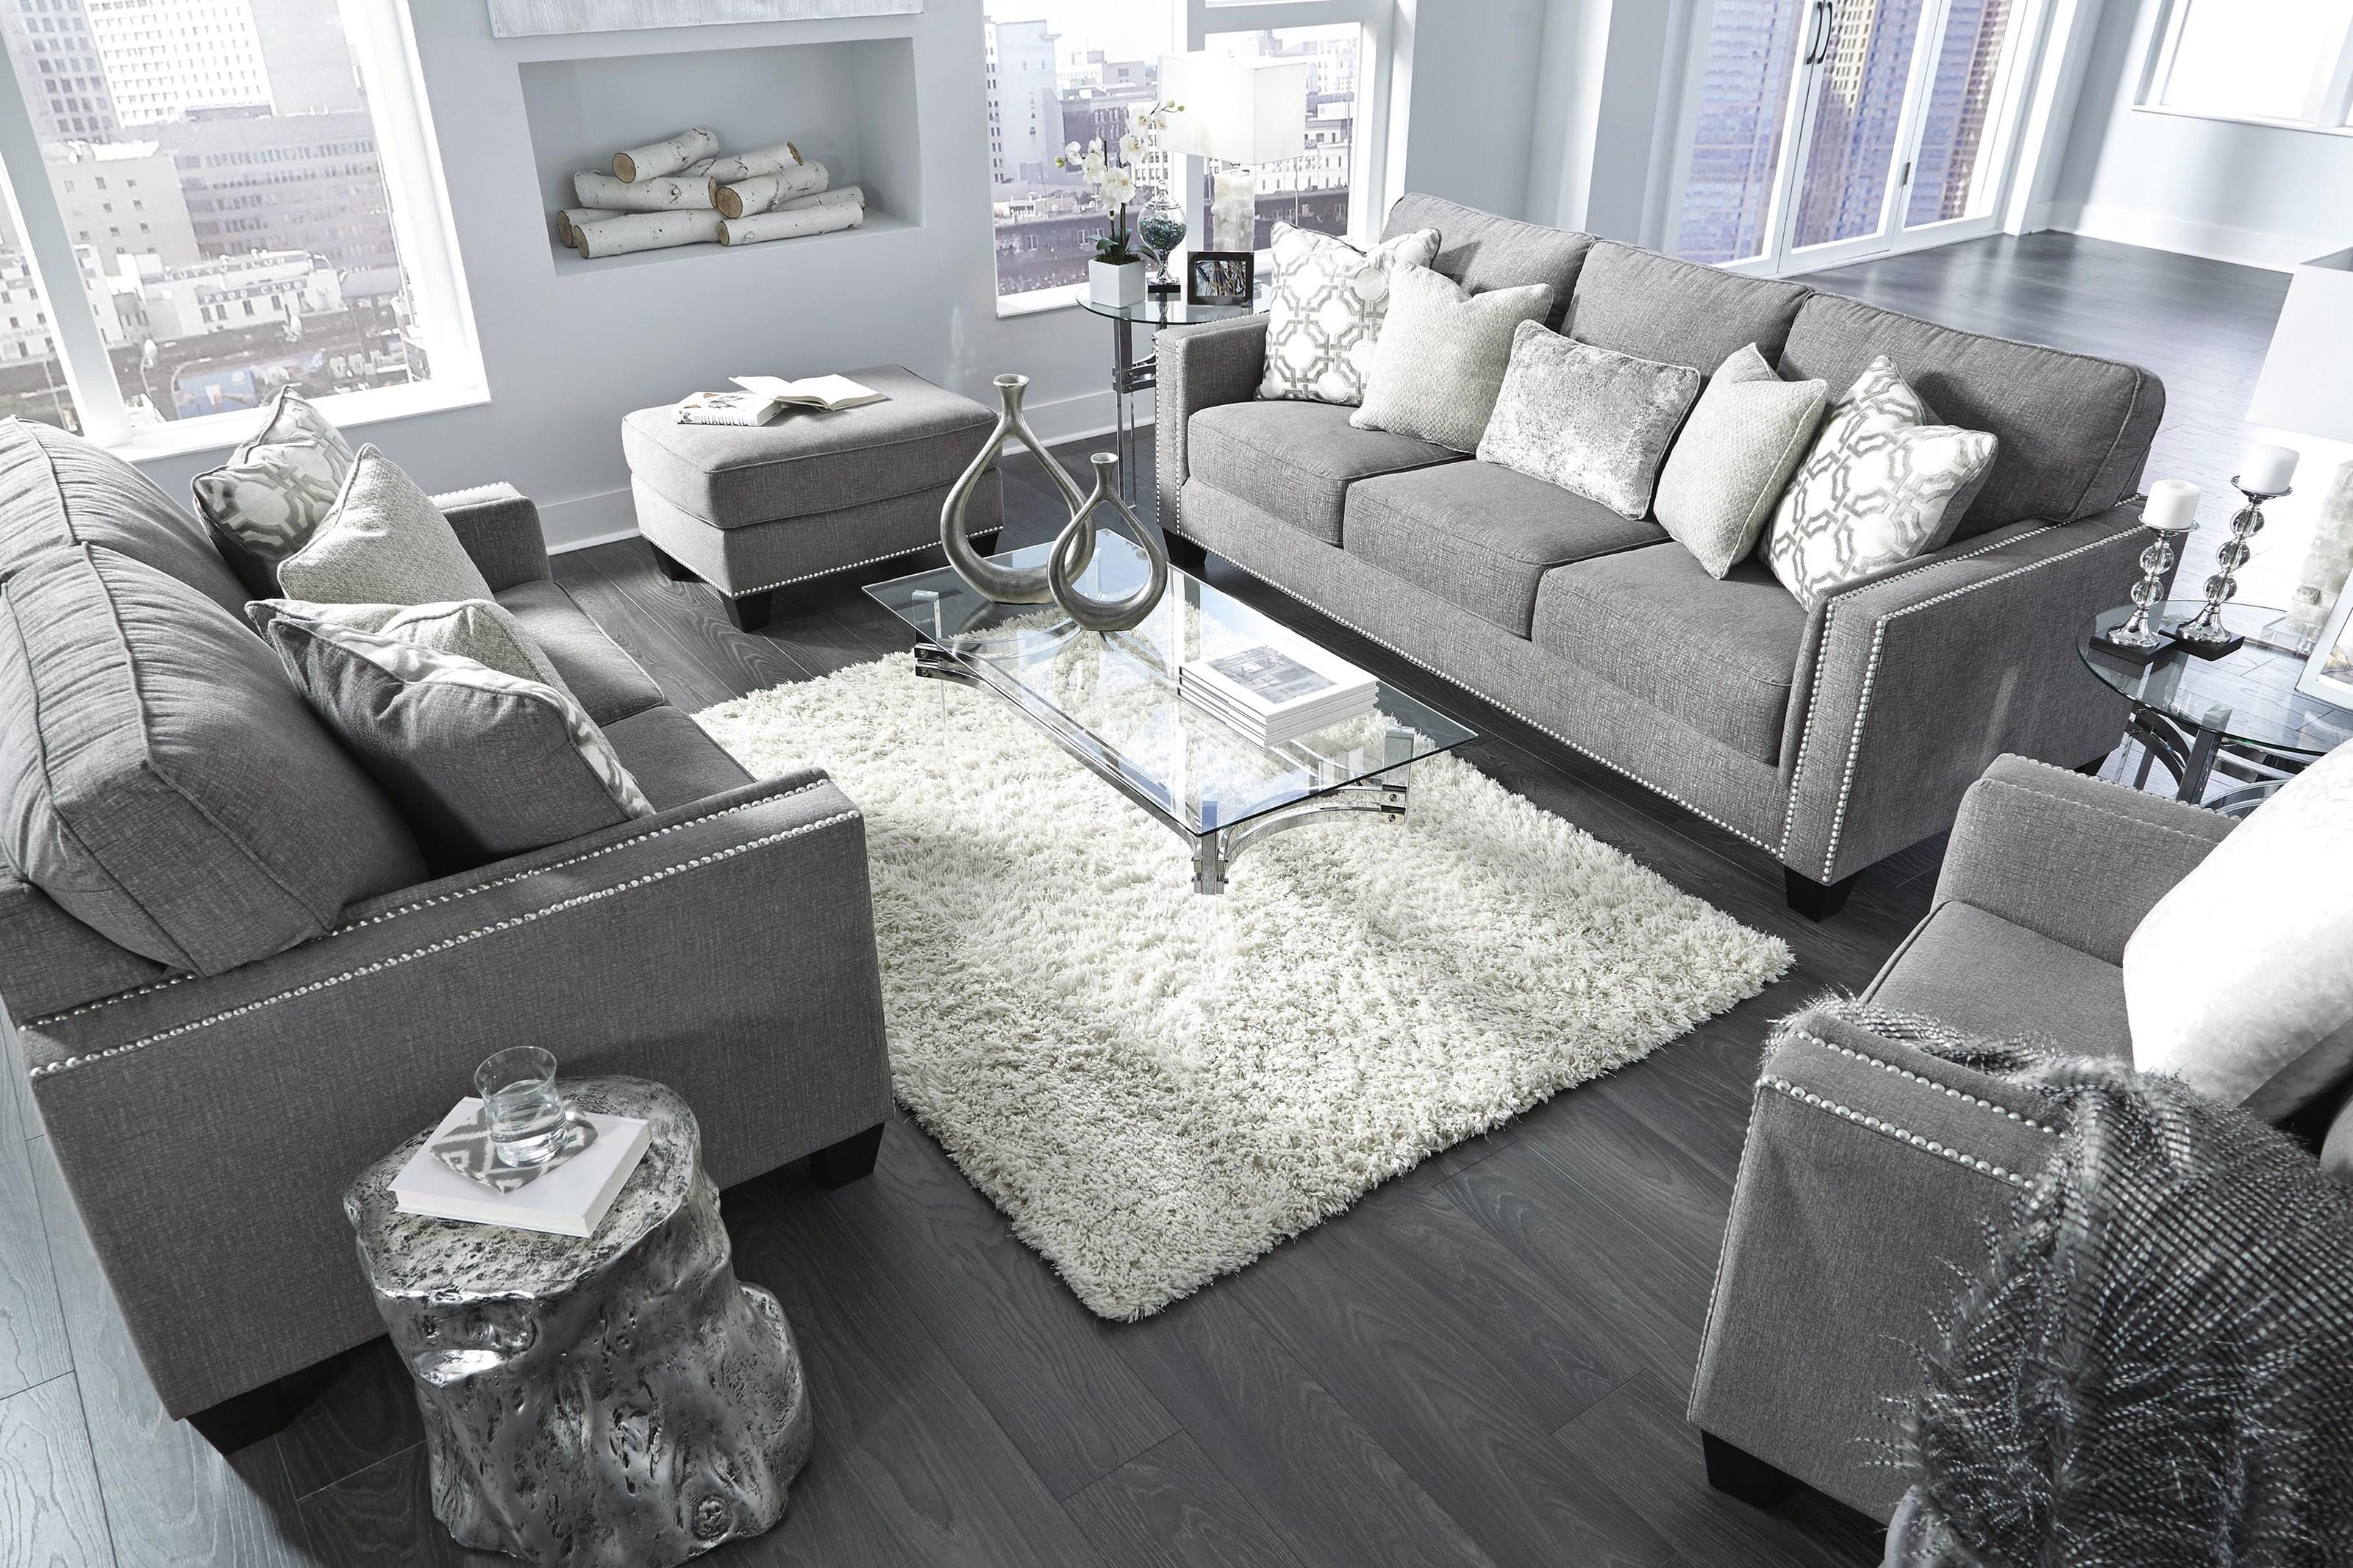 Barrali Sofa, Chair and Ottoman Set by Ashley Furniture at Sam Levitz Furniture